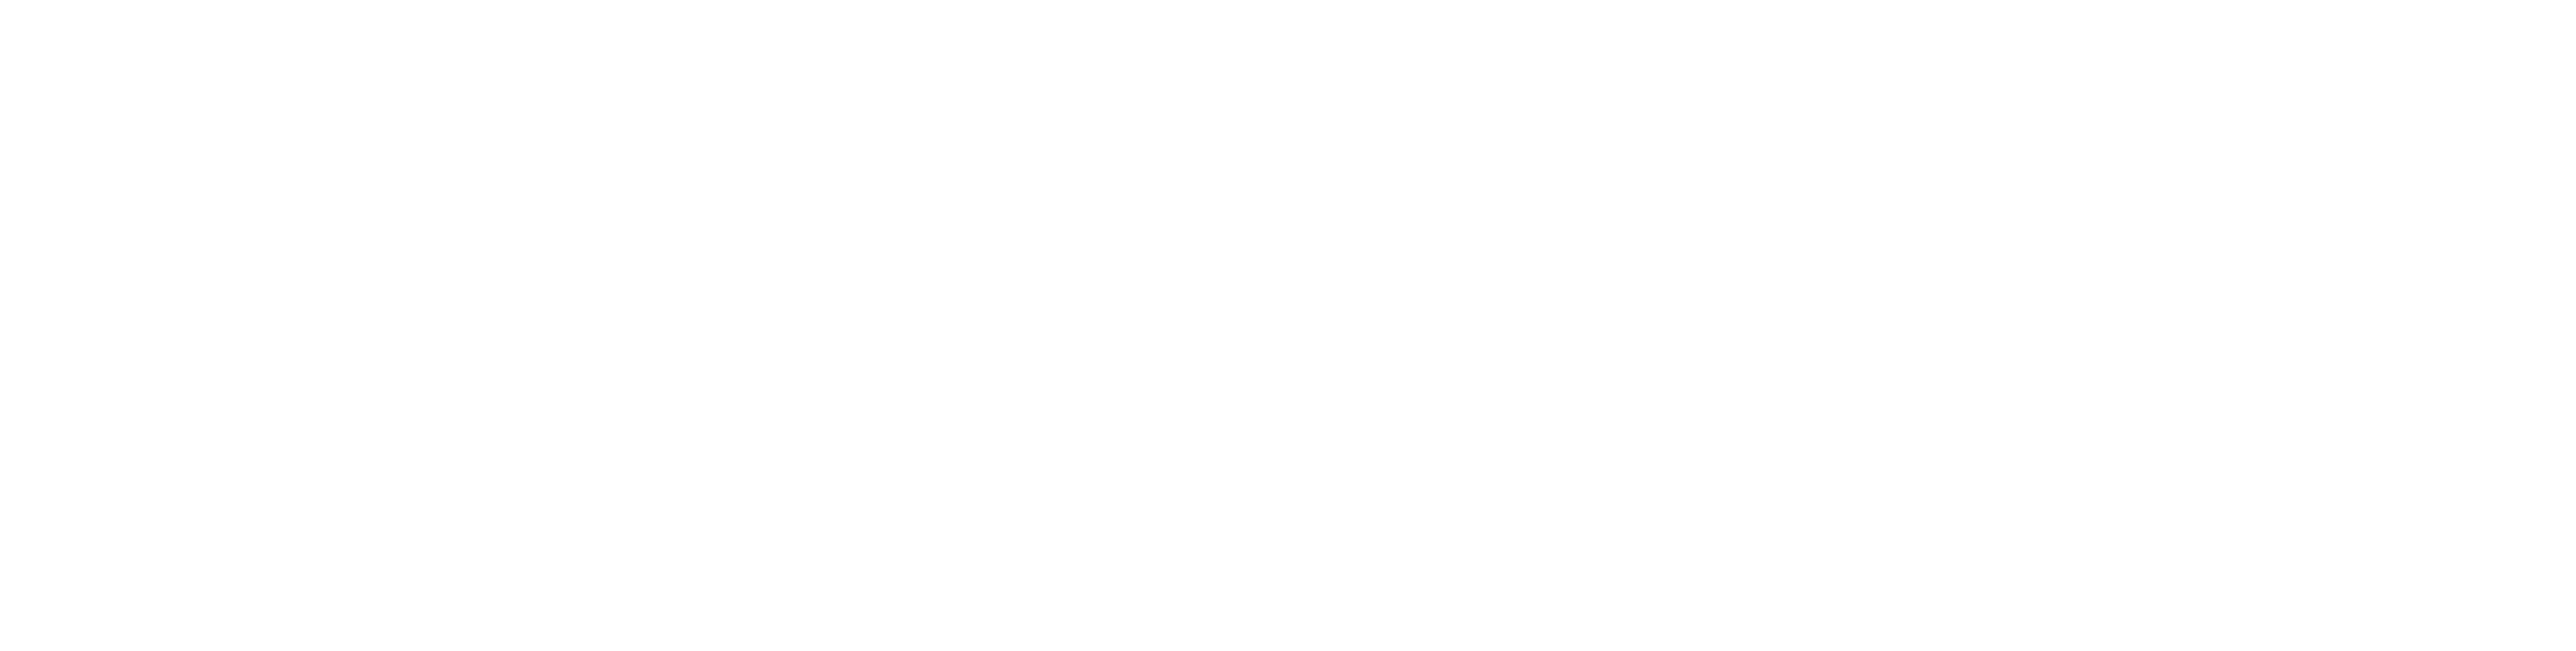 Energist